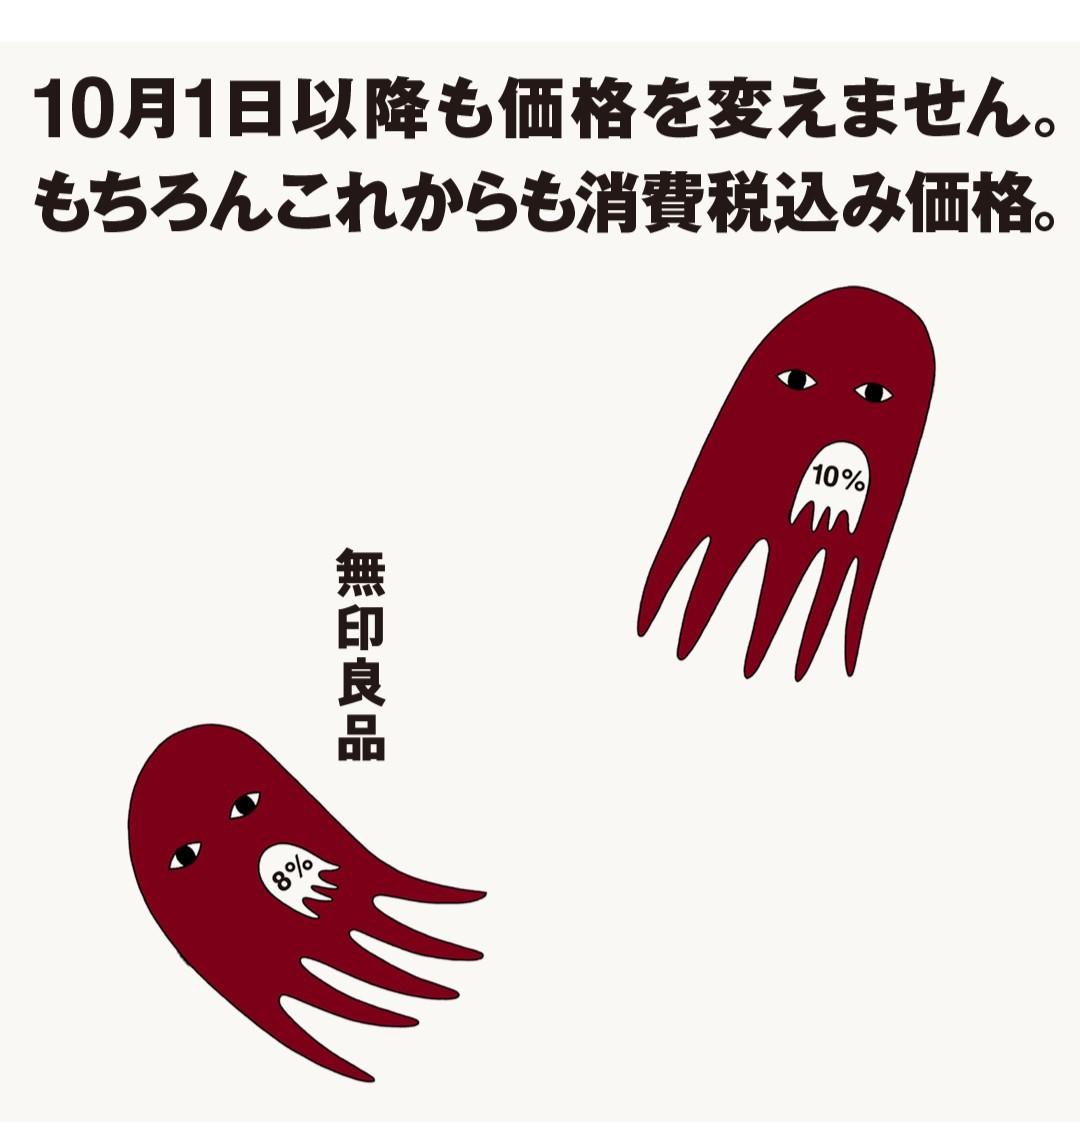 No.4405 10月1日(火):10月20日(日)から10月30日(水)の期間でFBL大学第13期スタートコースの募集を行います_b0113993_10212760.jpg